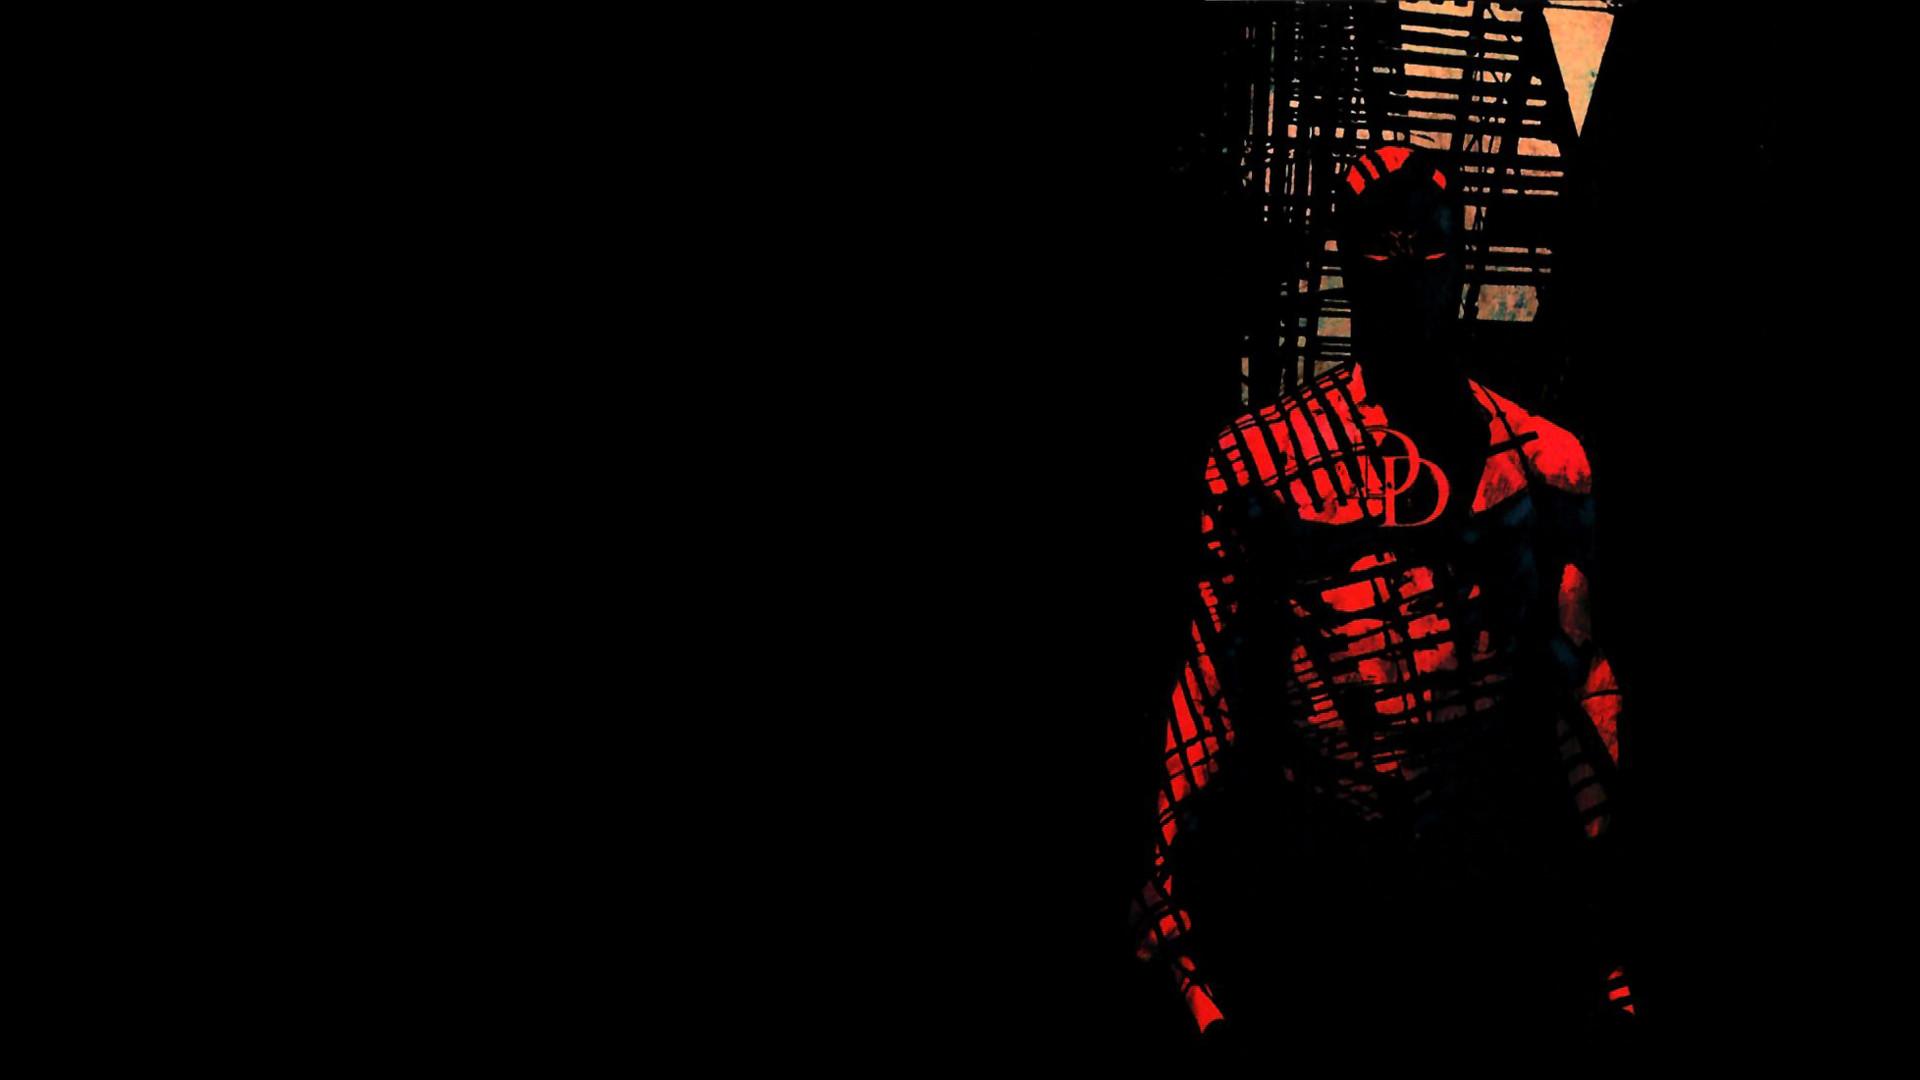 Daredevil Wallpaper 74 Pictures